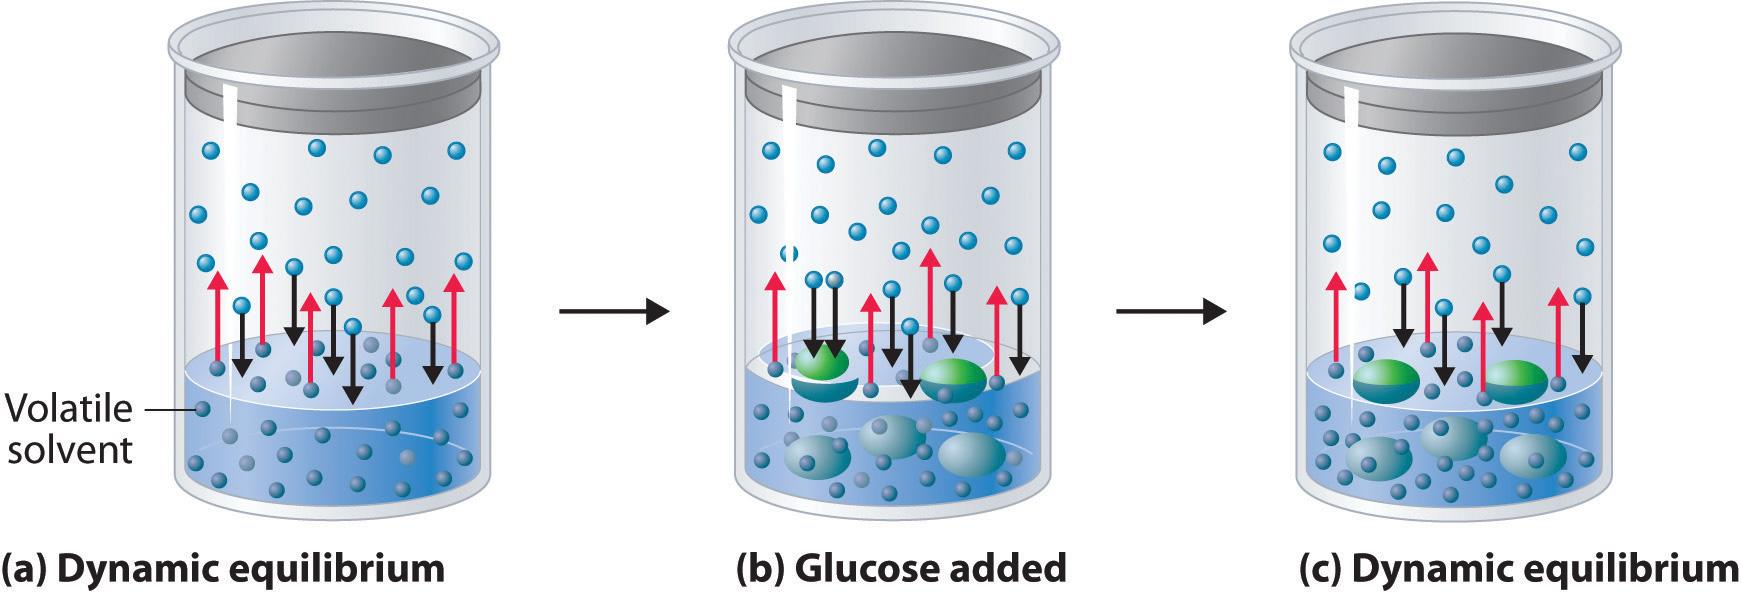 Esercizi svolti chimica - Chimica-online